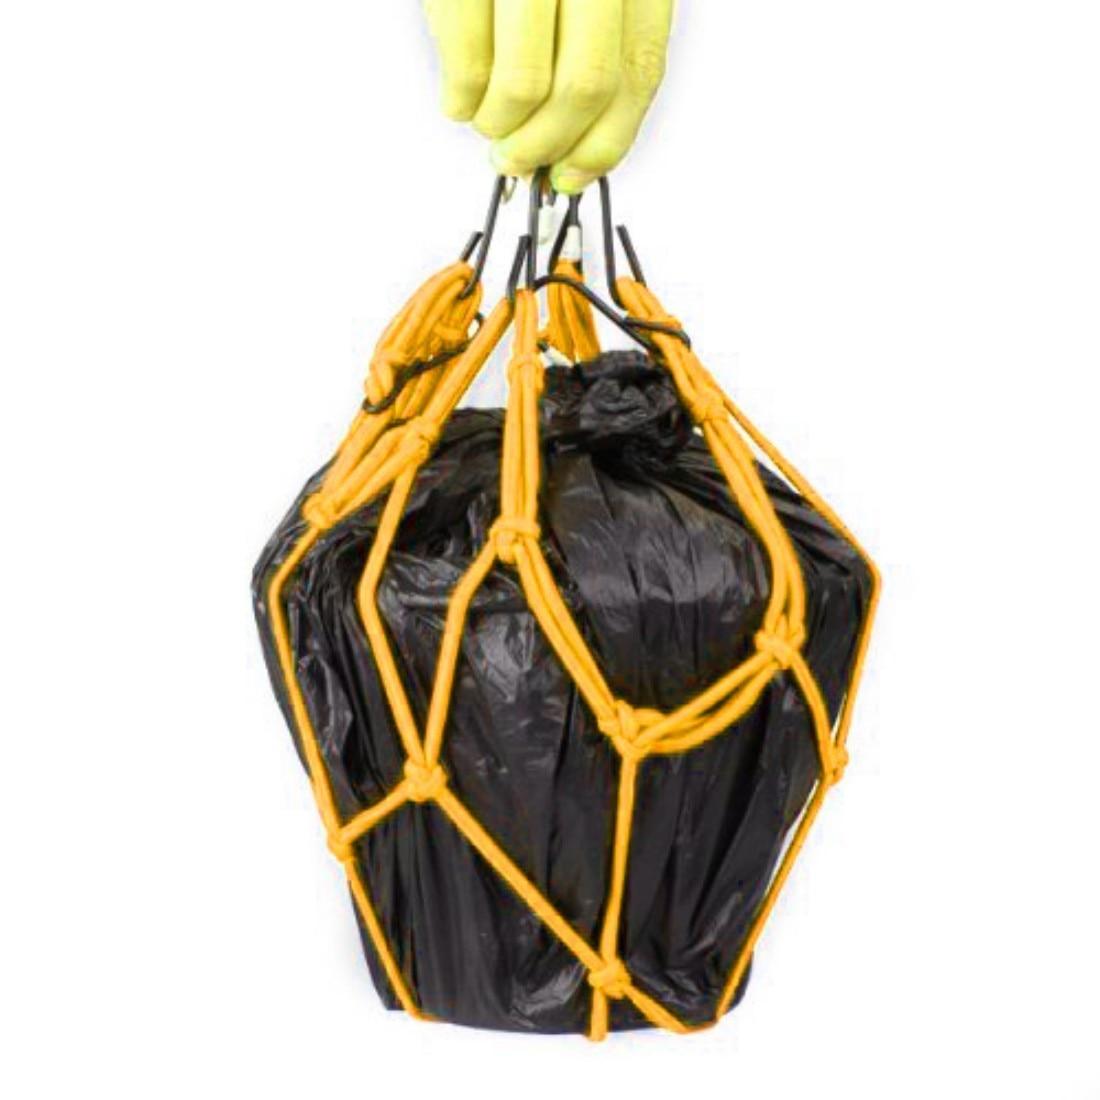 Dewtreetali 2017 Real Sale Cargo Net 6 Hooks Hold Down Cargo Luggage Debris Helmet Net Bag Mesh For Motorcycle Dirt Bike Scooter